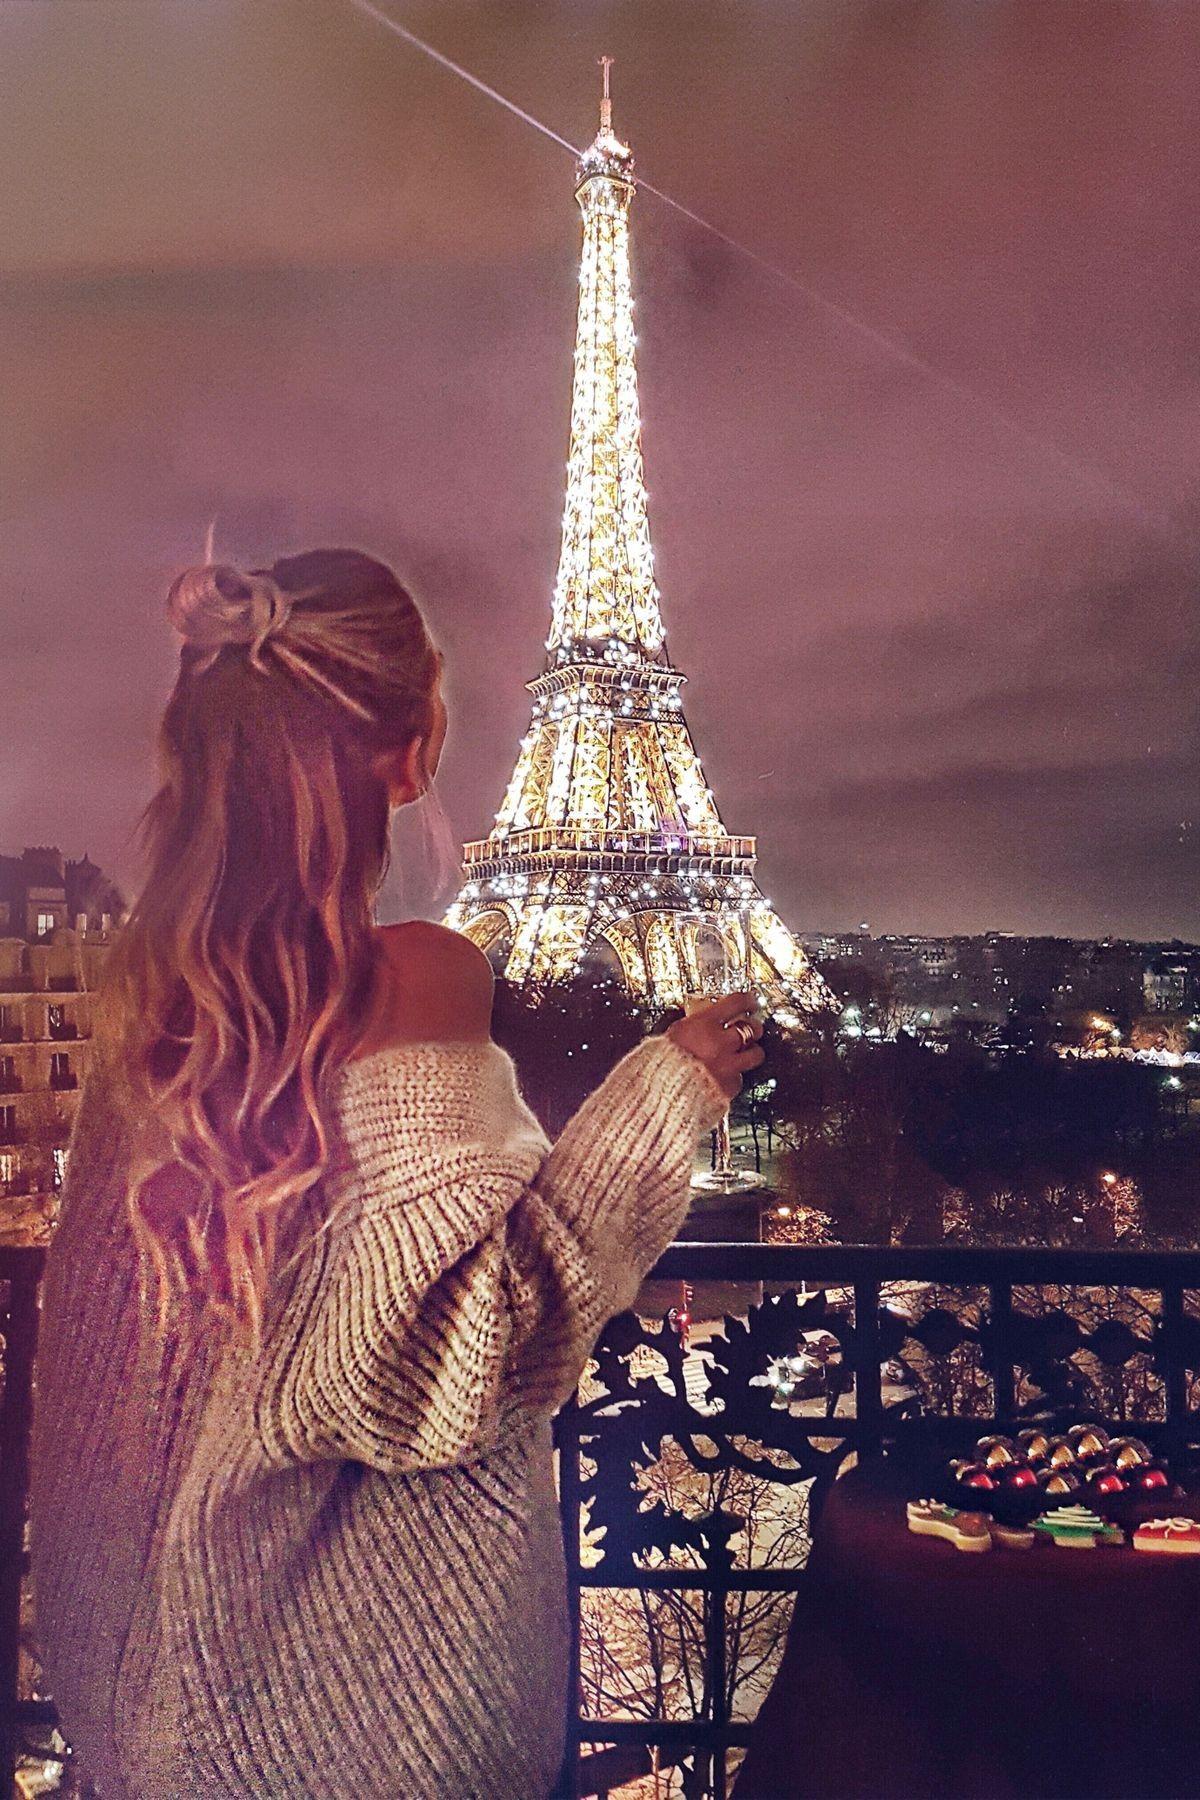 Jauh Perjalanan Luas Pengetahuan Menara Eiffel Fotografi Pemandangan